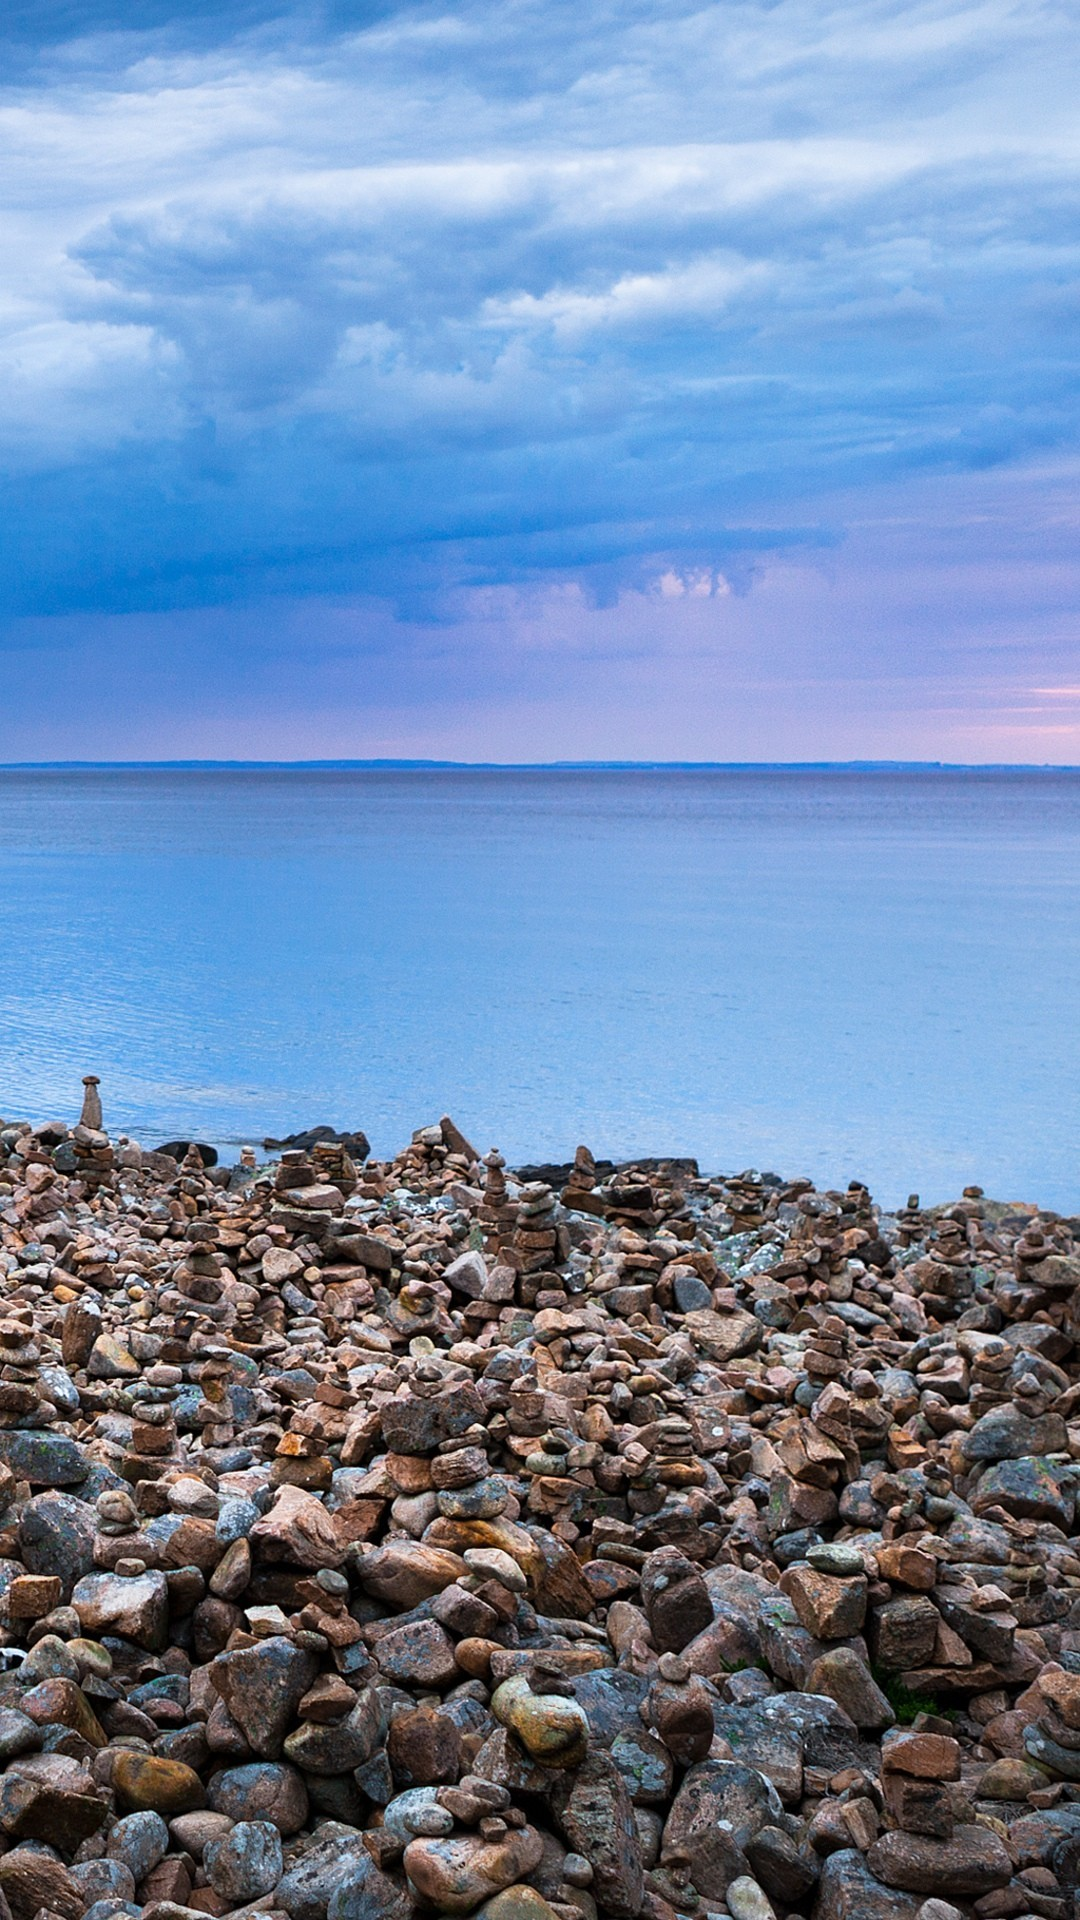 Explore Hd Wallpaper Iphone, Beach Rocks, and more!